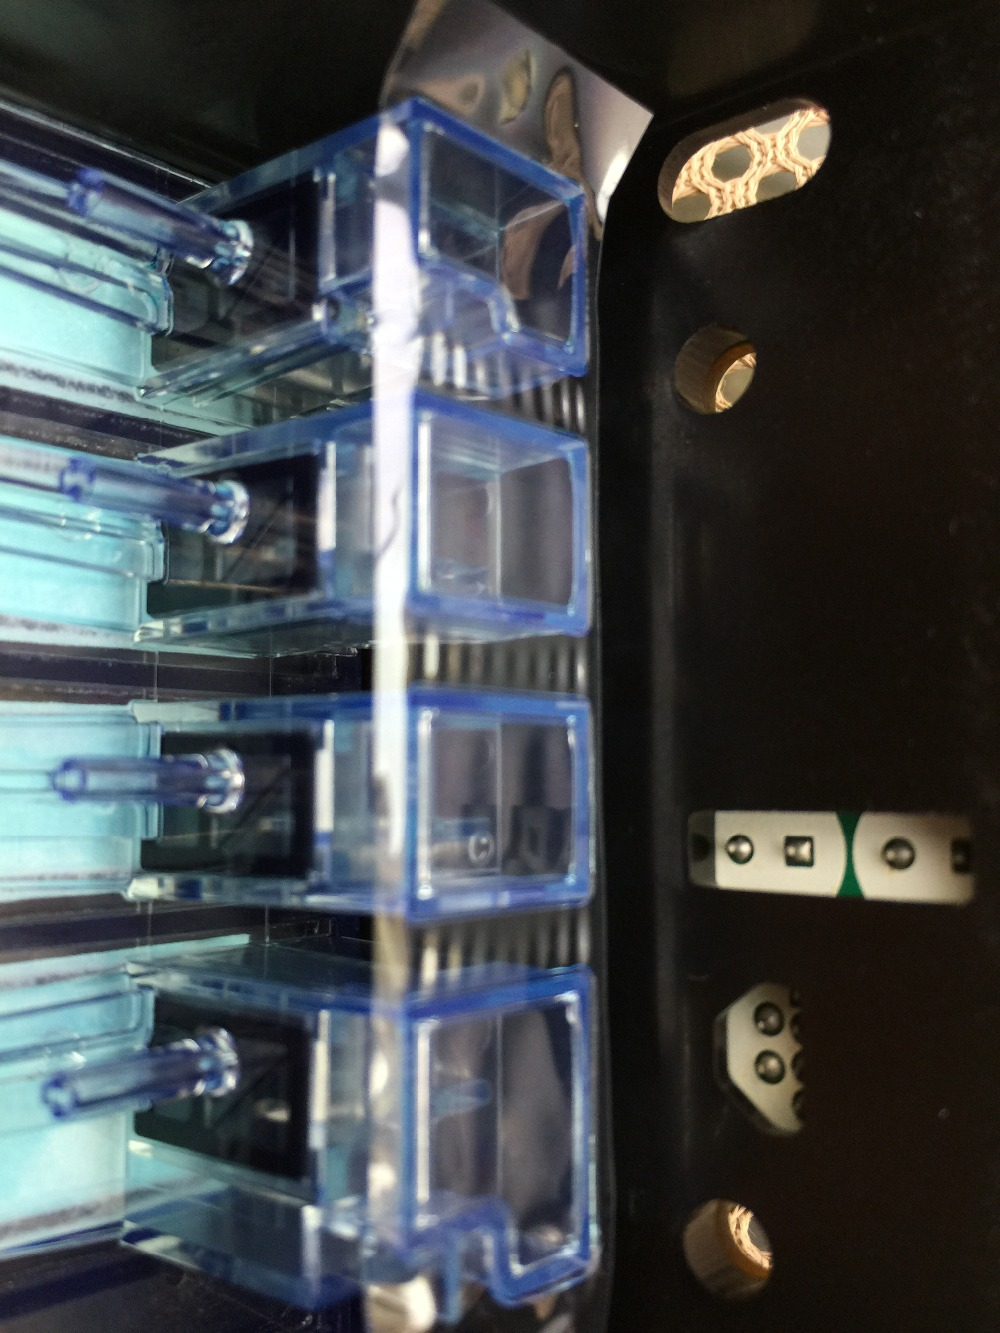 50PCS Brand NEW  PRINTHEAD Genuine OEM Print Head For HP 932 933 for HP 6100 6600 6700 7110 7610 картридж t2 cn053ae 932xl для hp officejet 6100 6600 6700 7110 7610 black